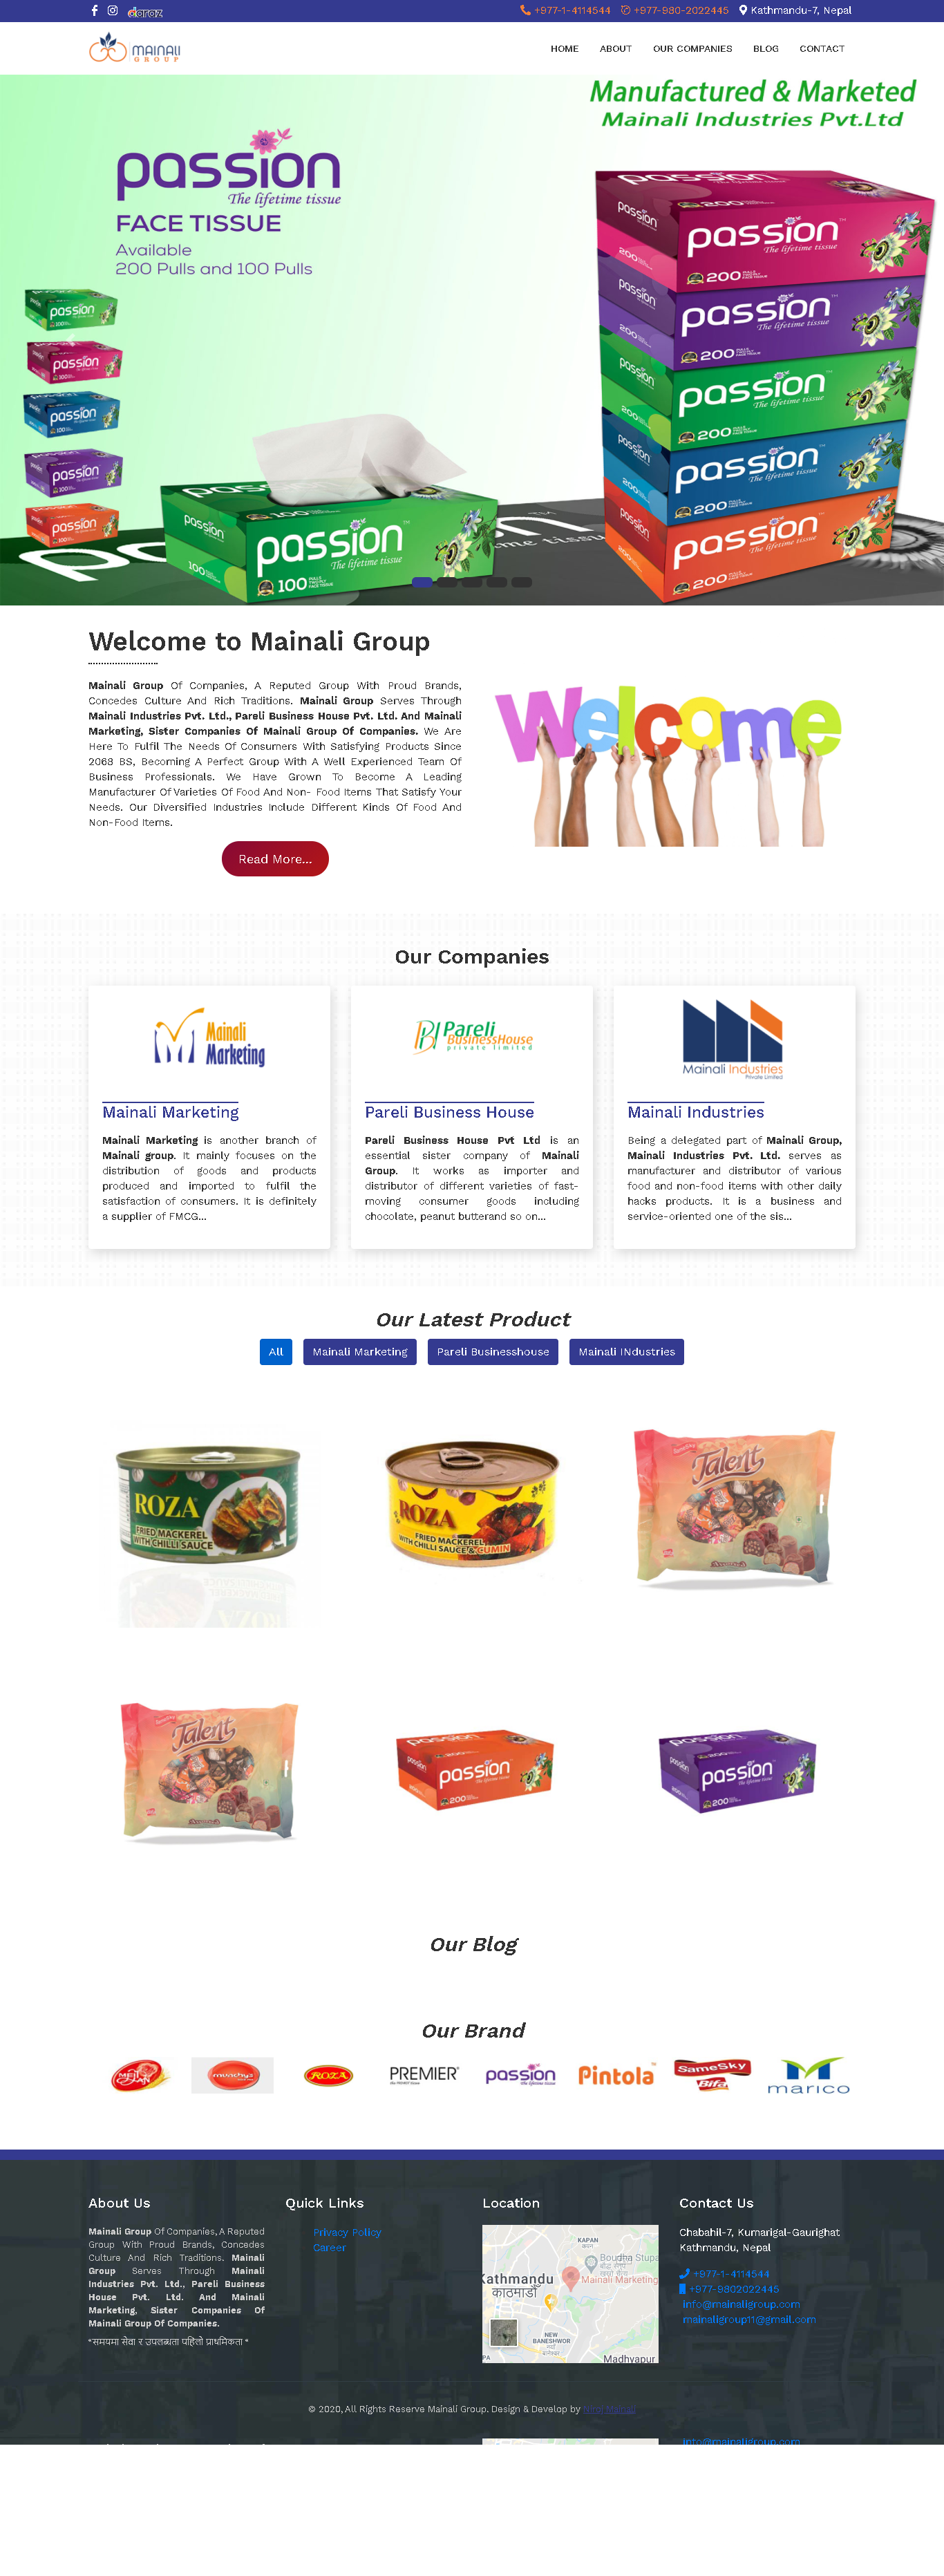 mainaligroup.com